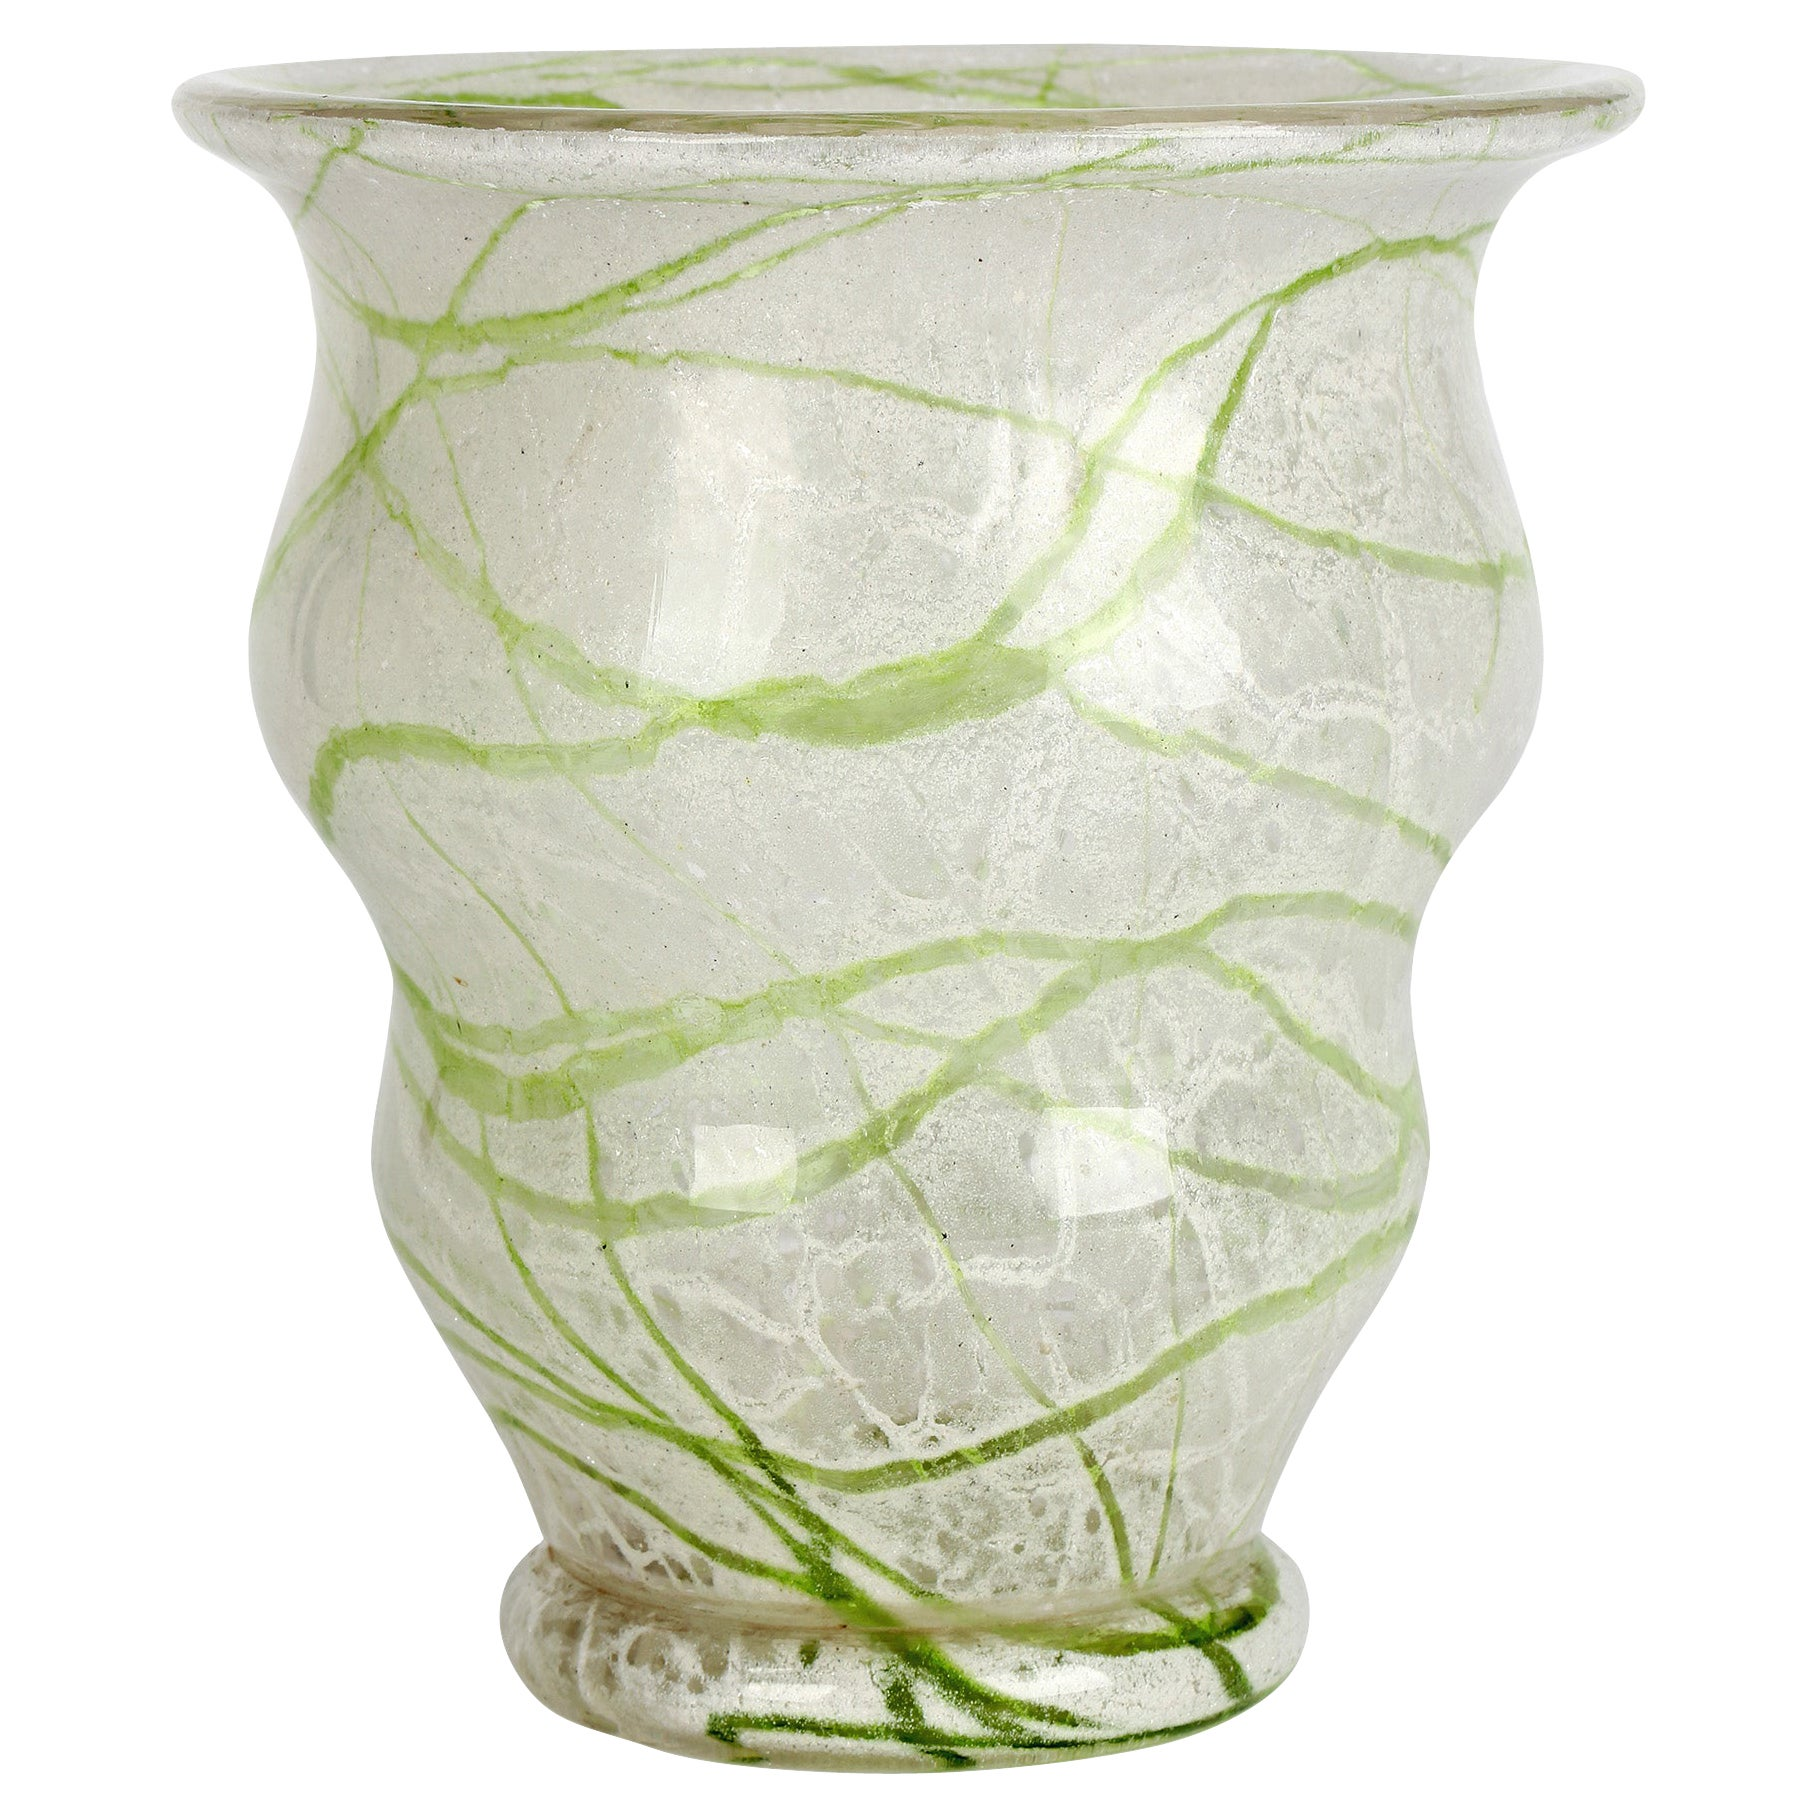 Loetz Art Deco Schaumglas Art Glass Vase